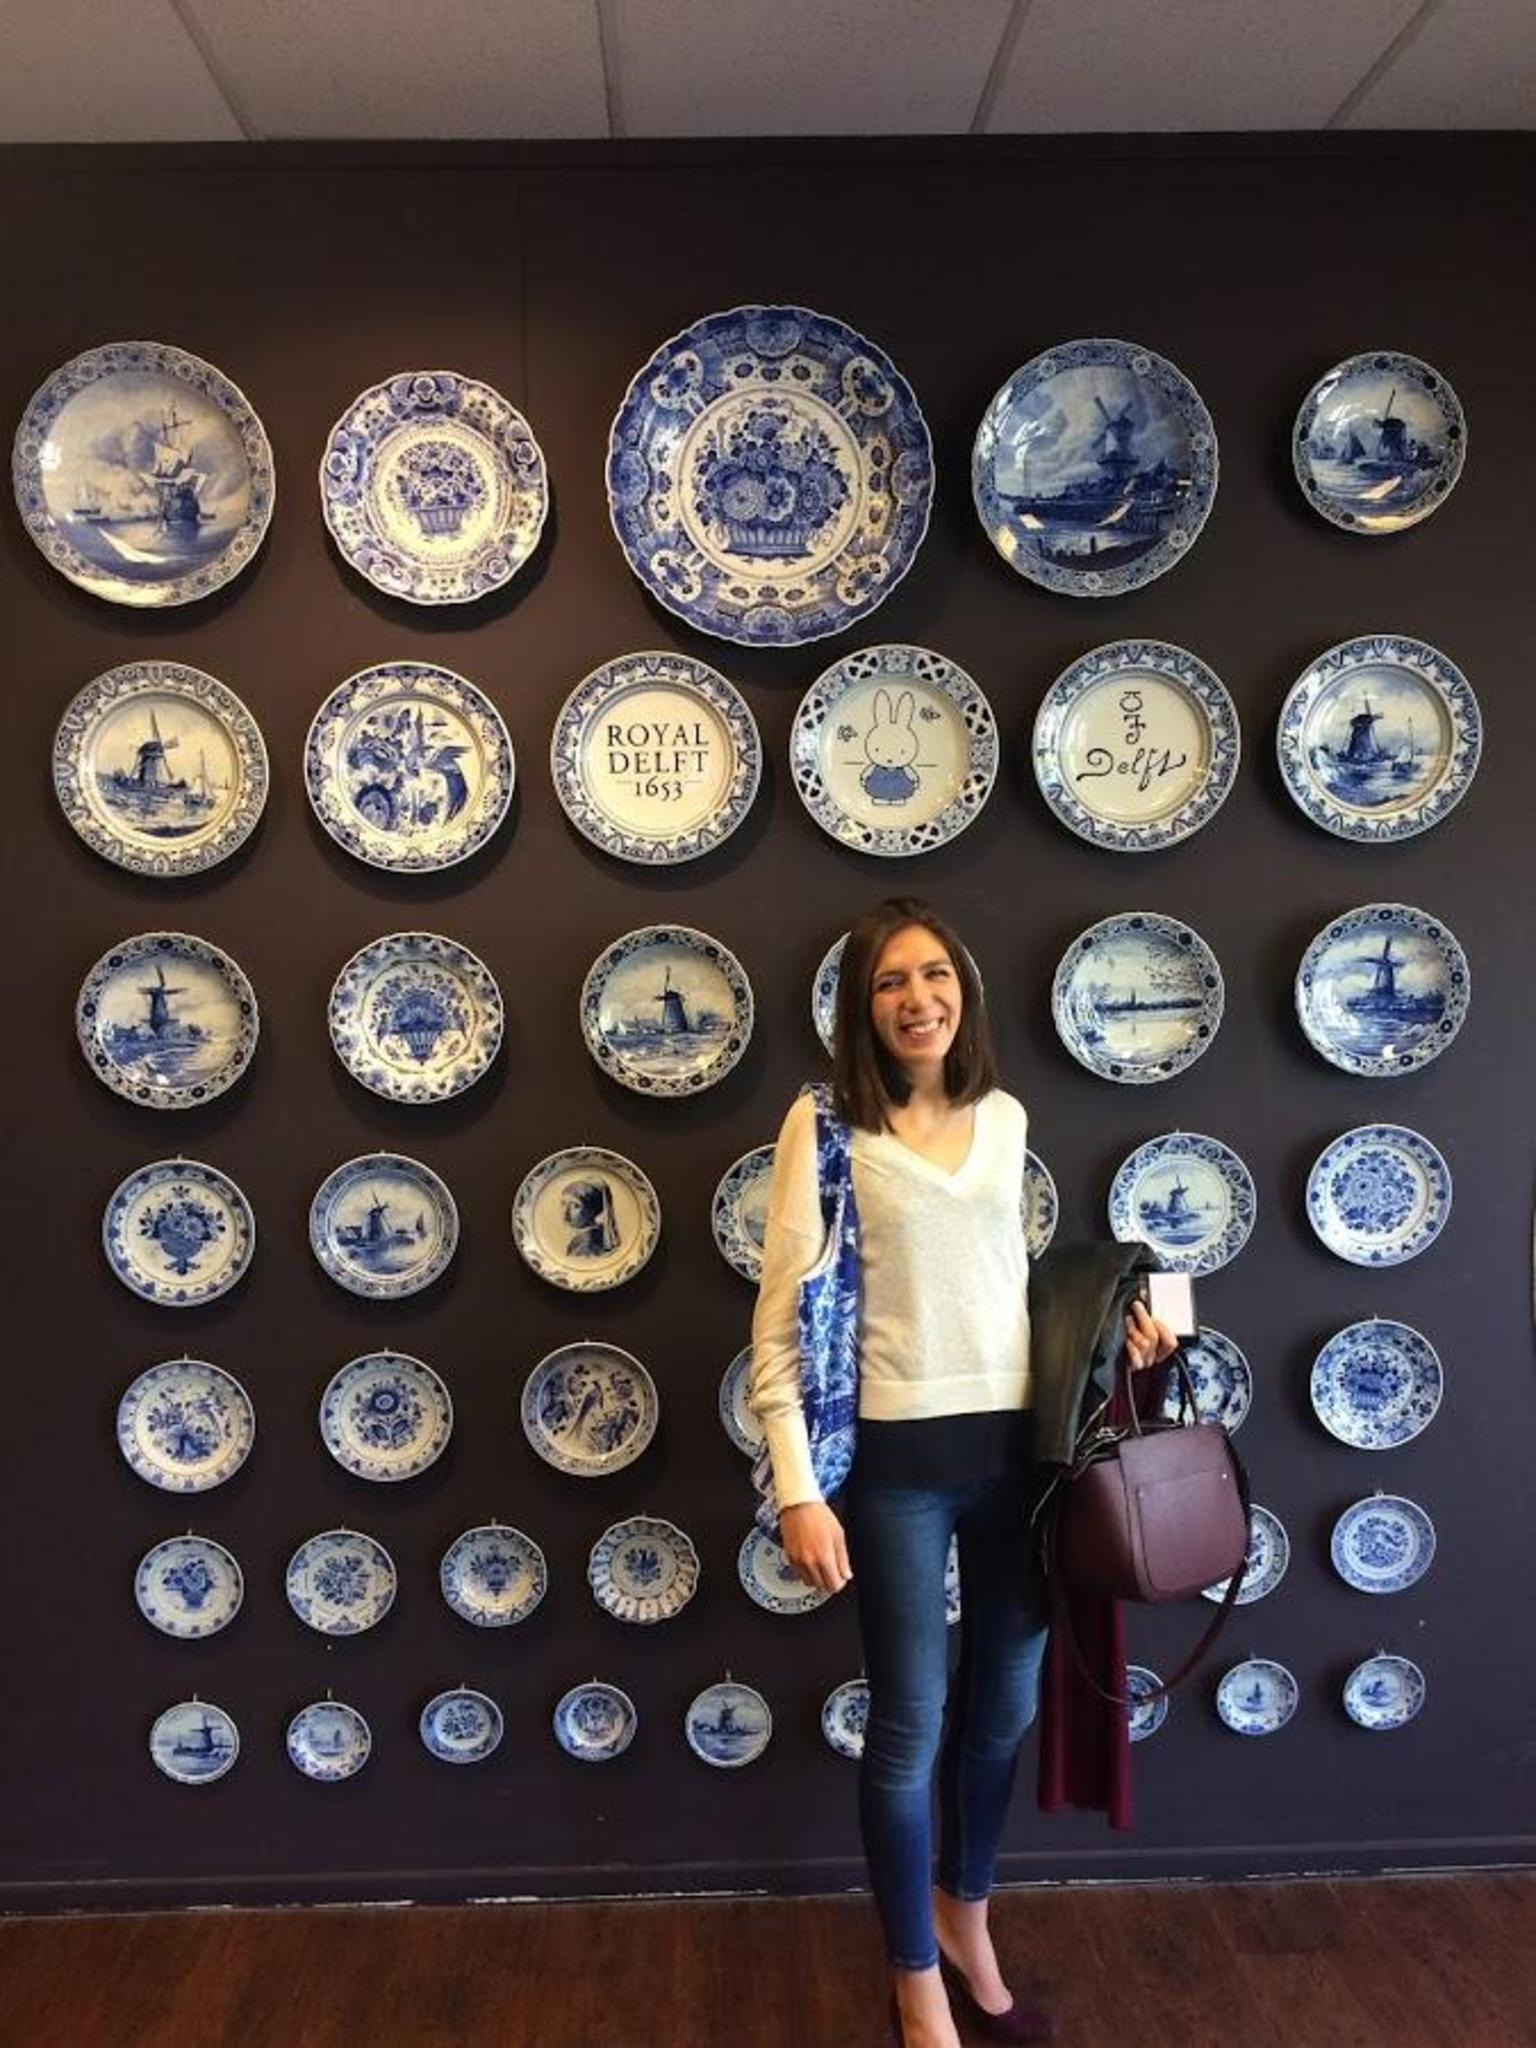 MORE PHOTOS, Royal Delft: Delftblue factory & museum ticket